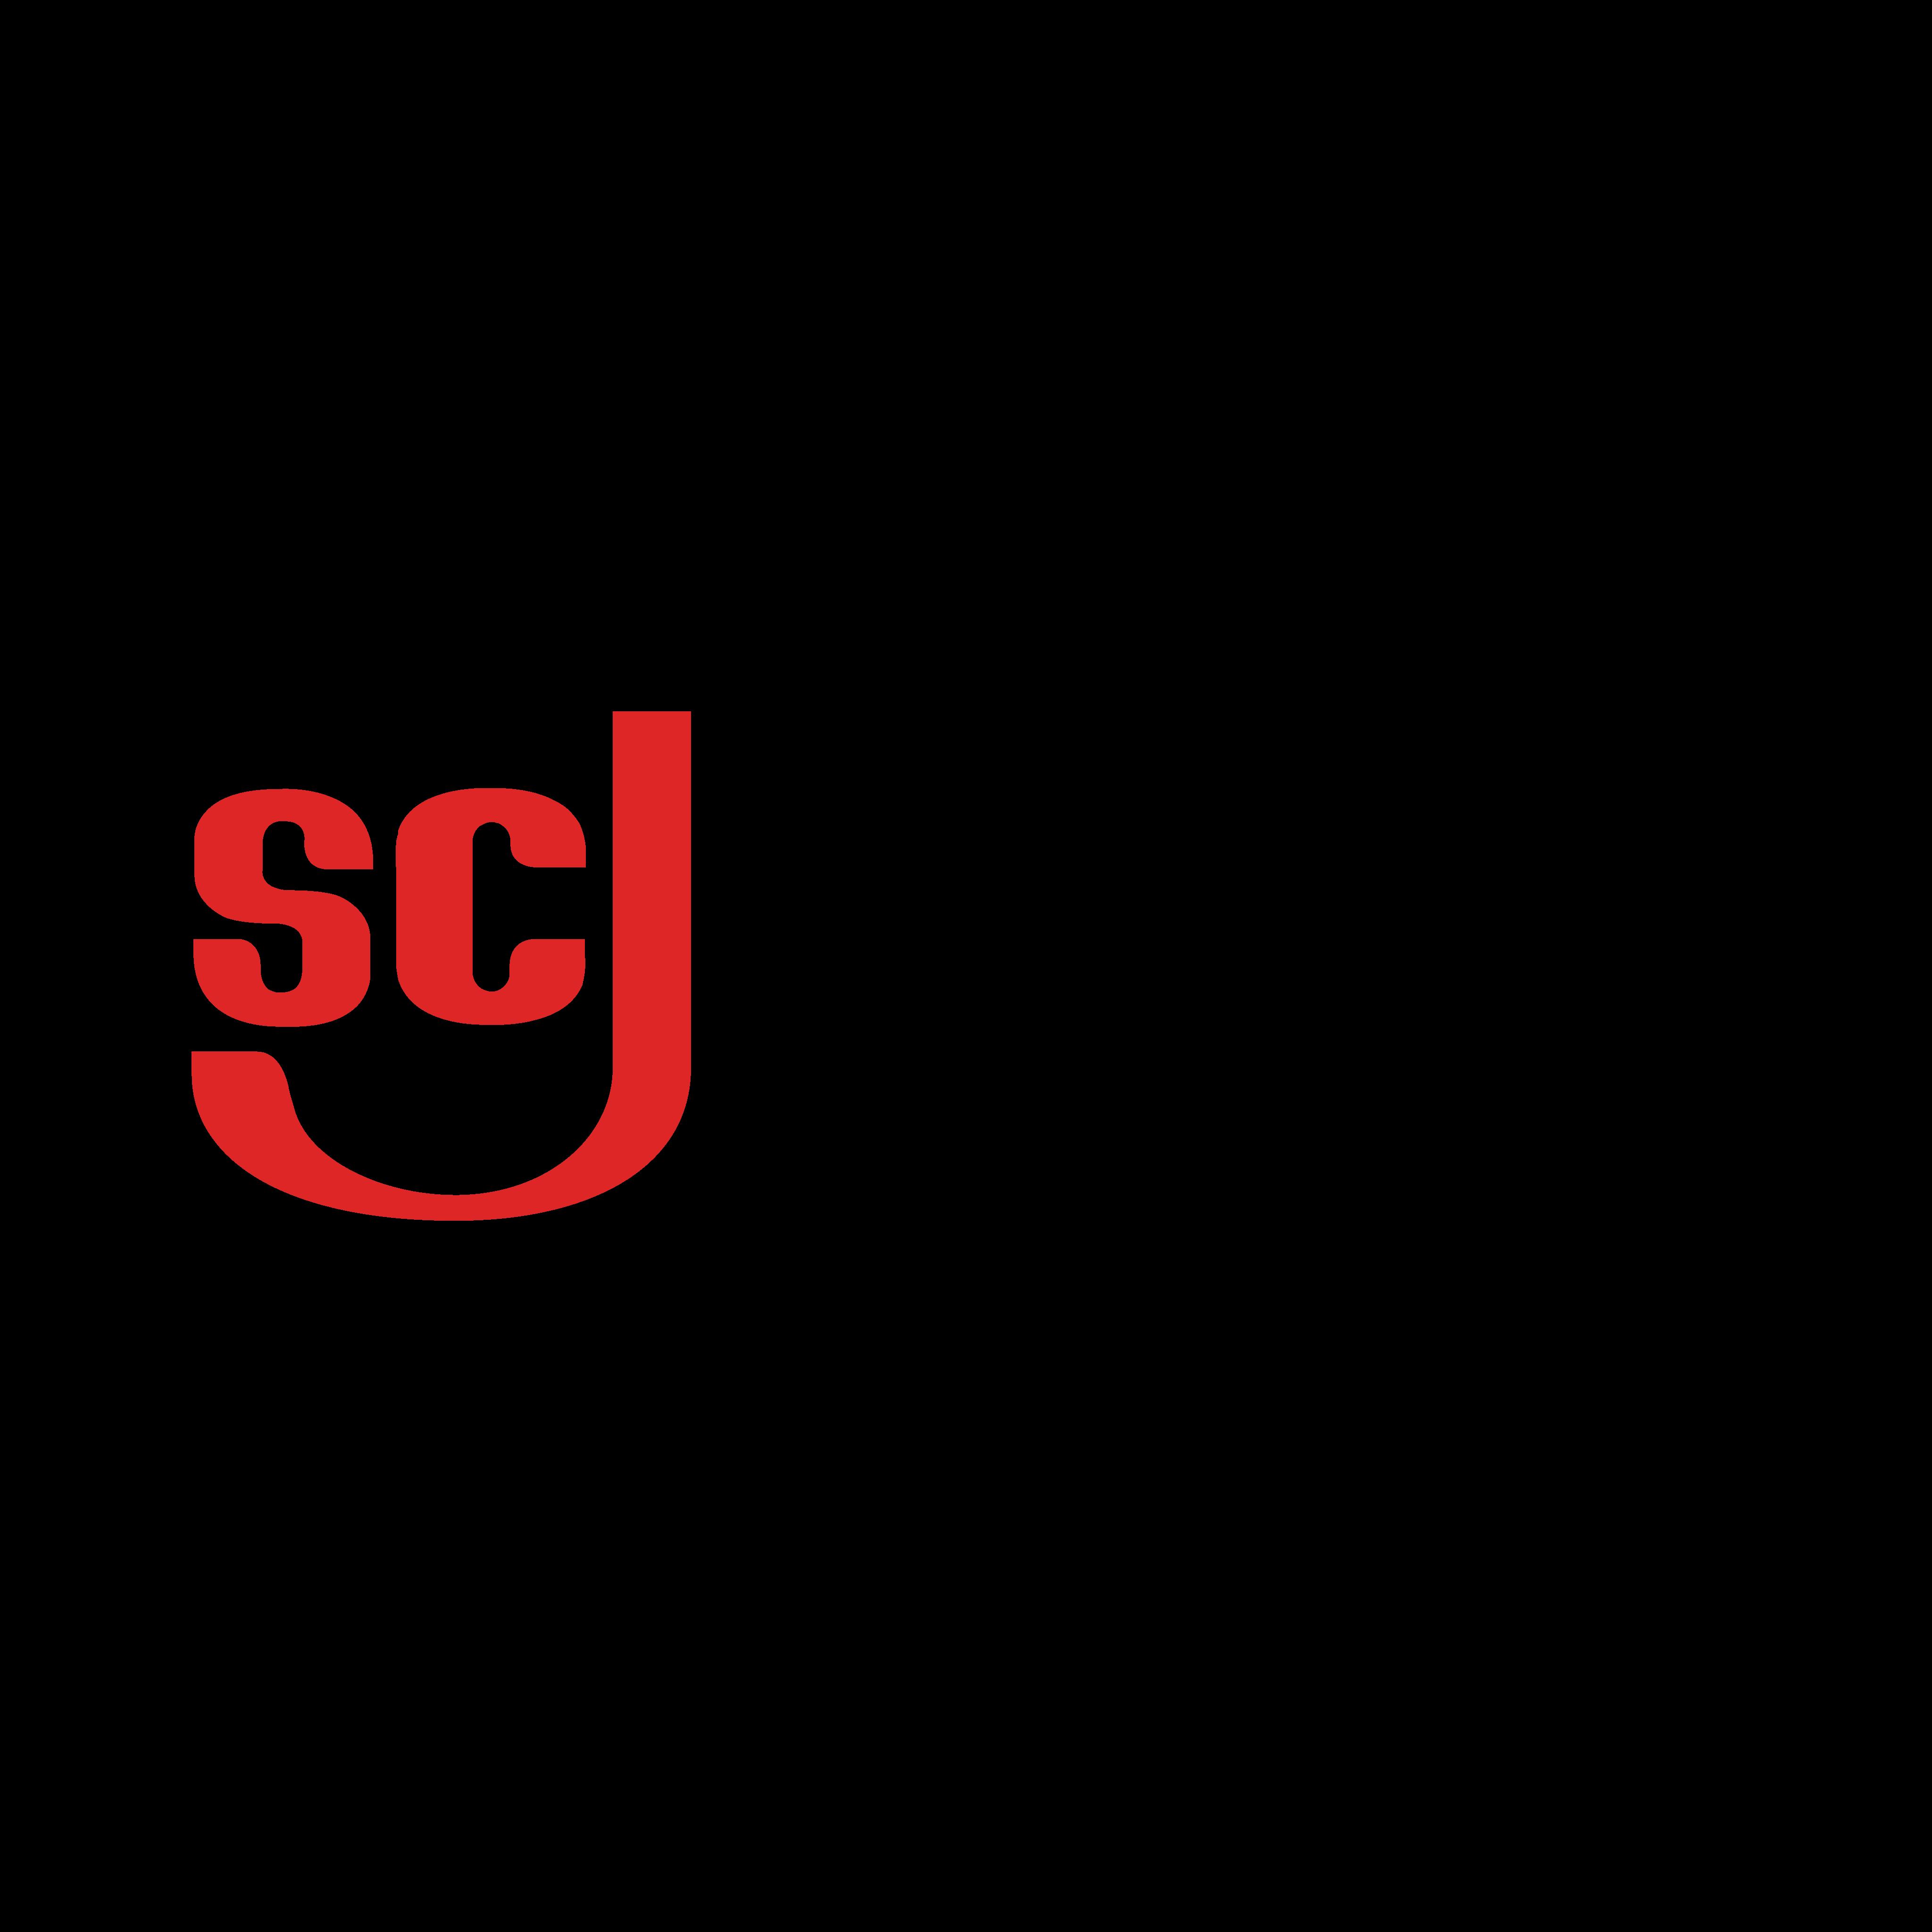 sc johnson logo 0 - SC Johnson Logo